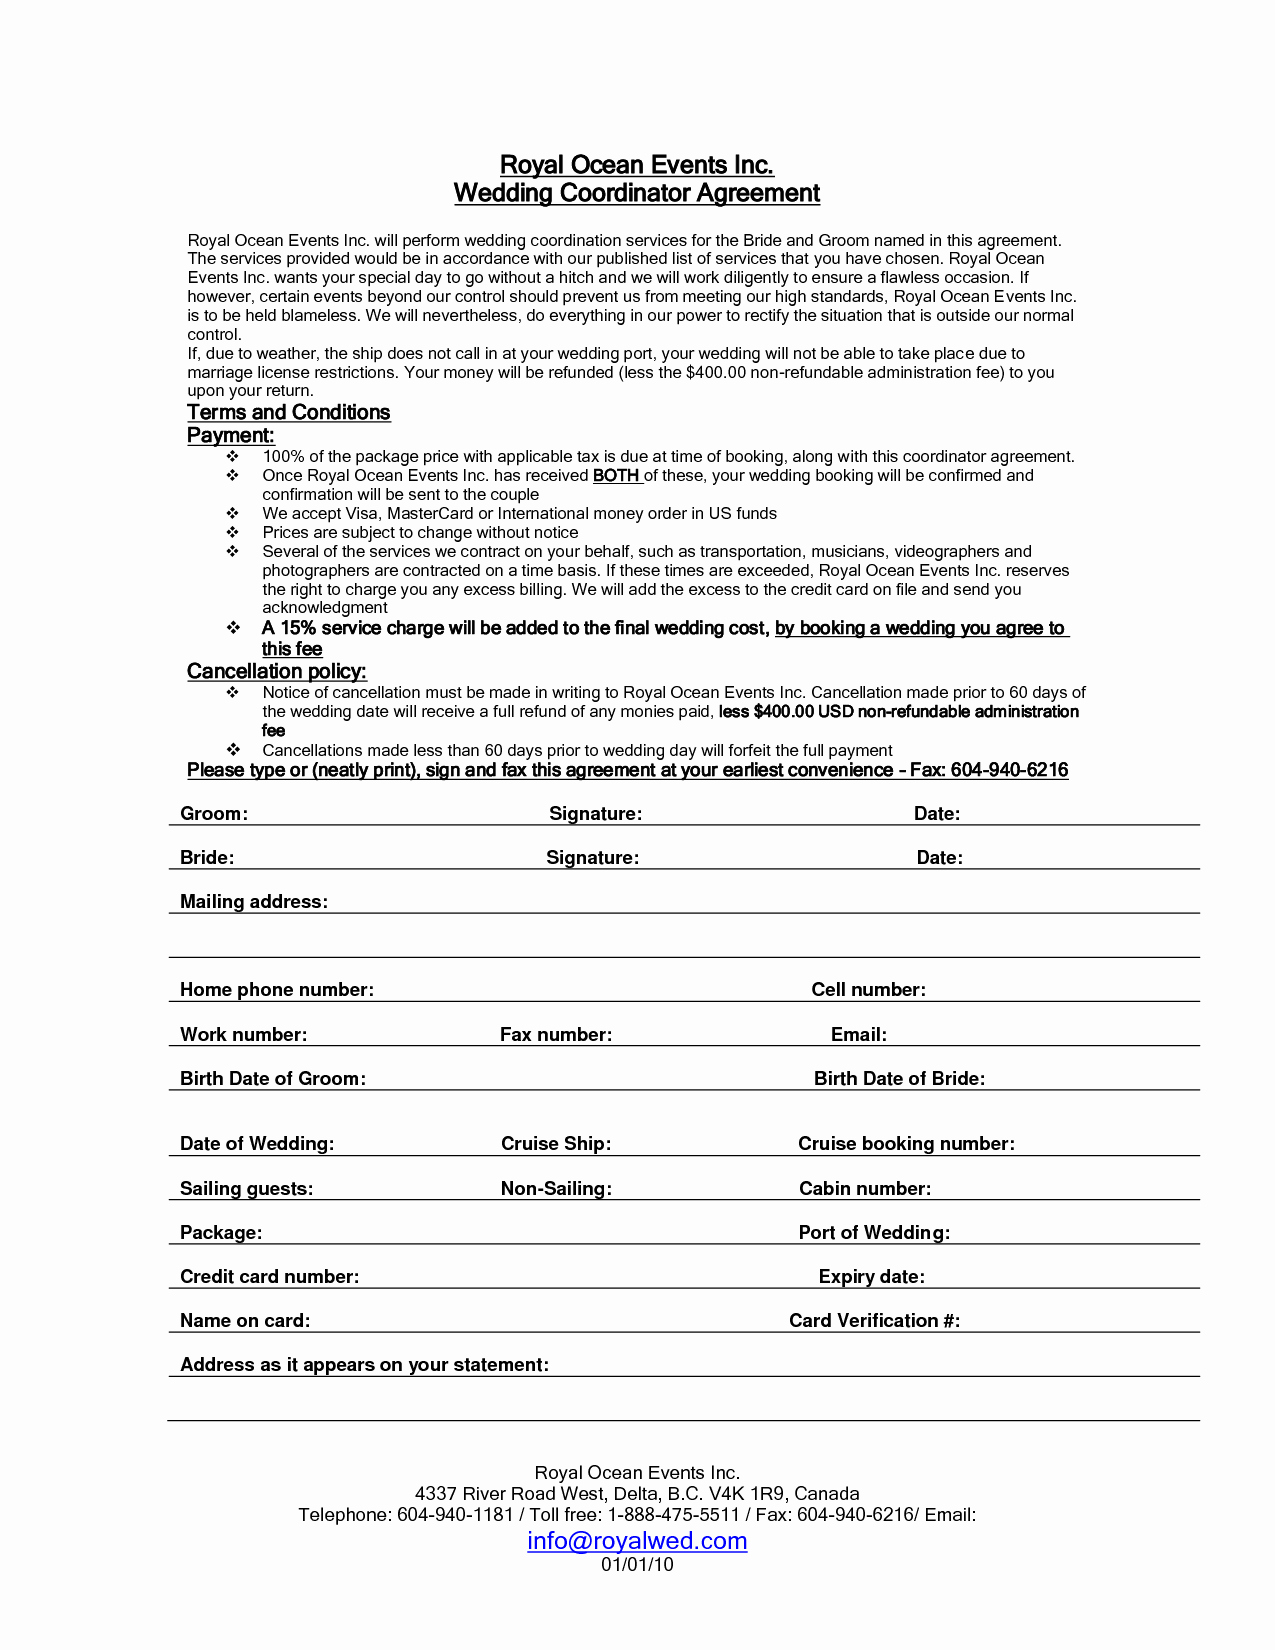 post printable wedding planner contract agreement